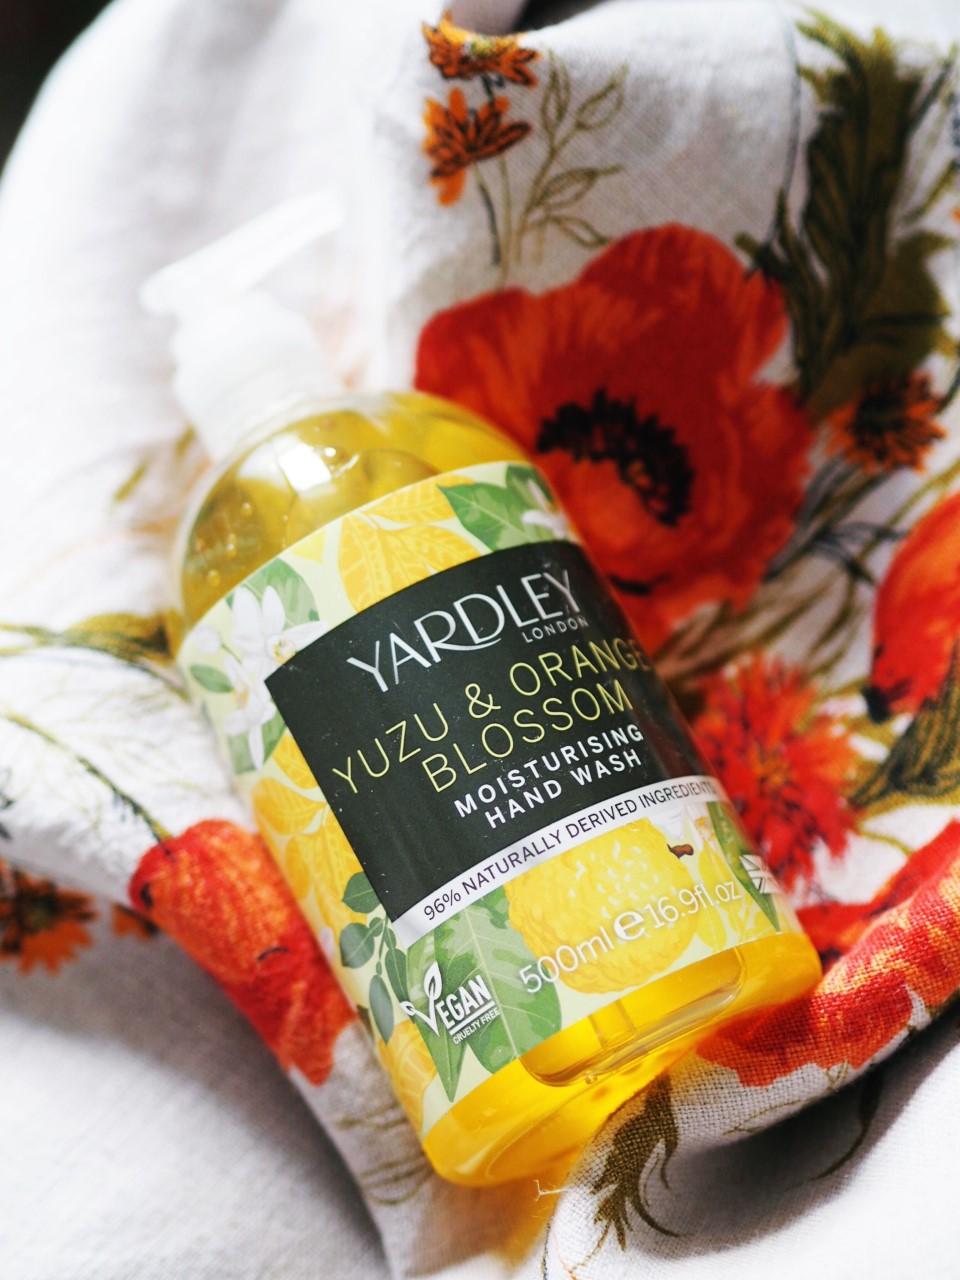 Yardley Hand Wash